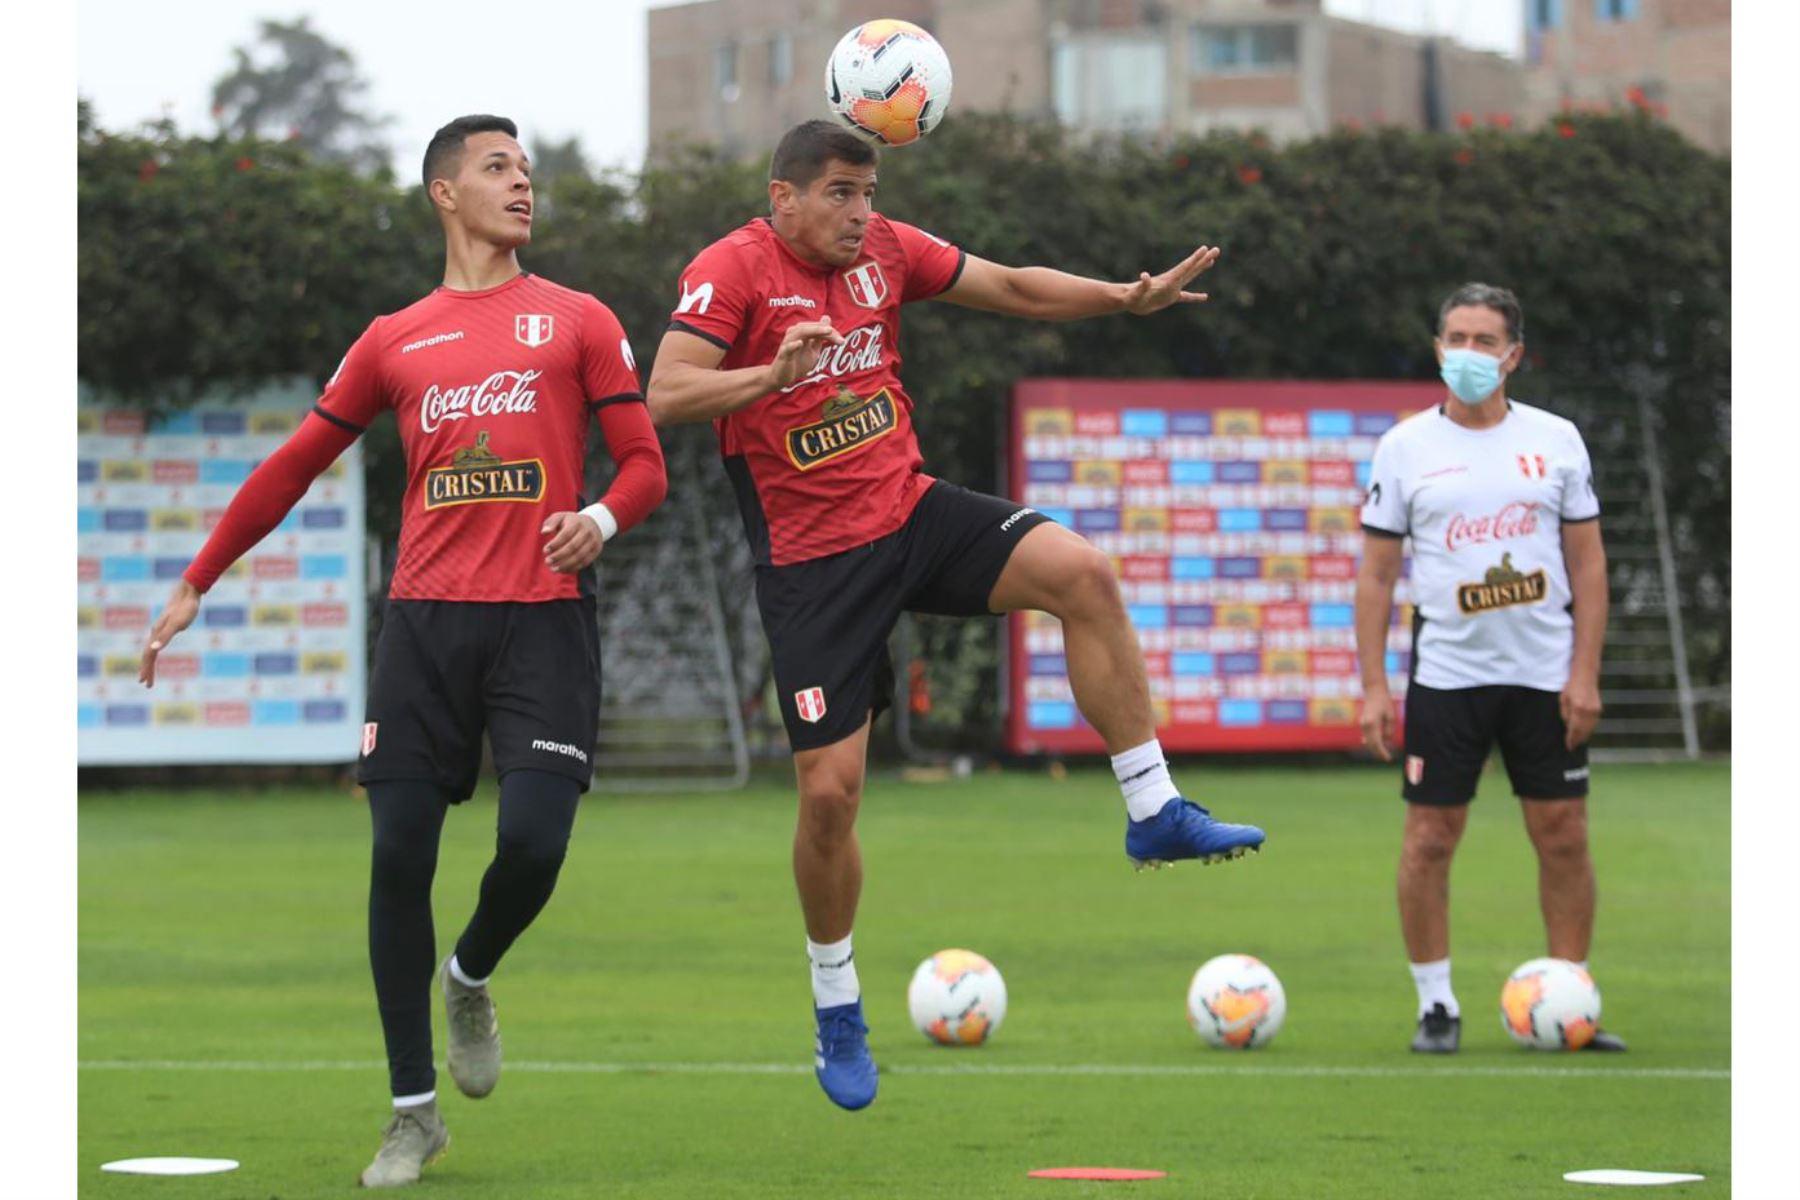 Photo: Twitter/Peruvian Soccer Federation